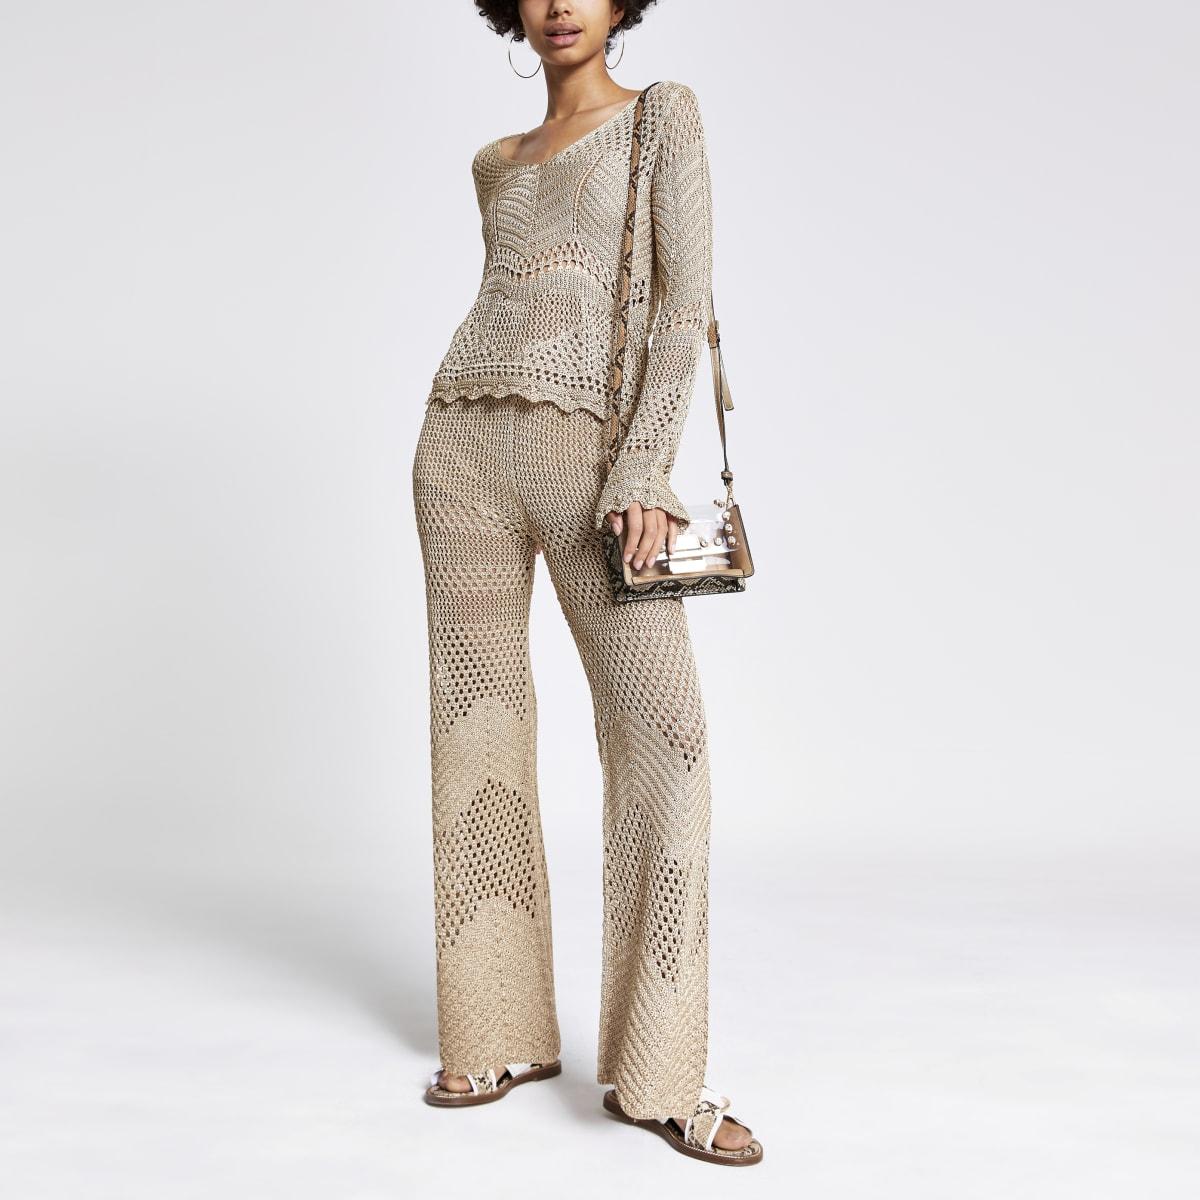 Gold crochet wide leg pants